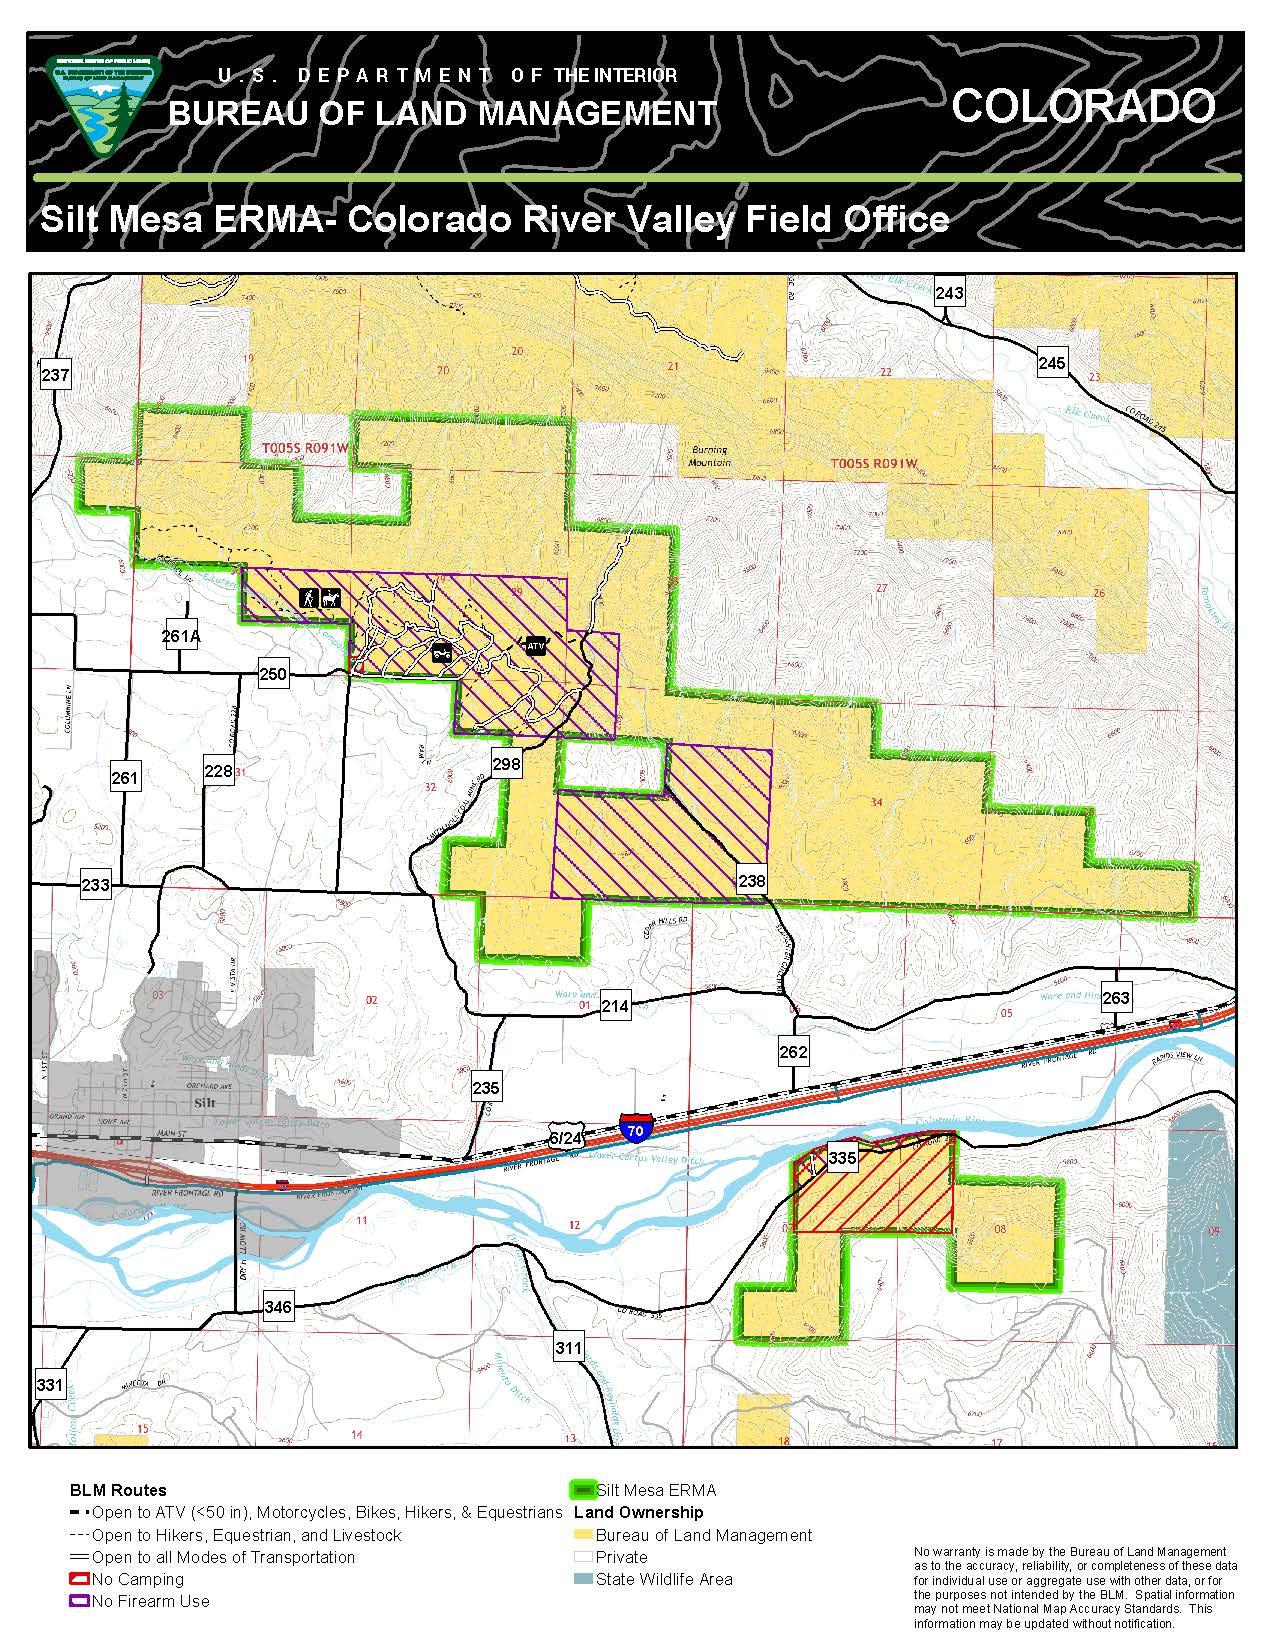 Silt Mesa Extensive Recreation Management Area Map BUREAU OF LAND